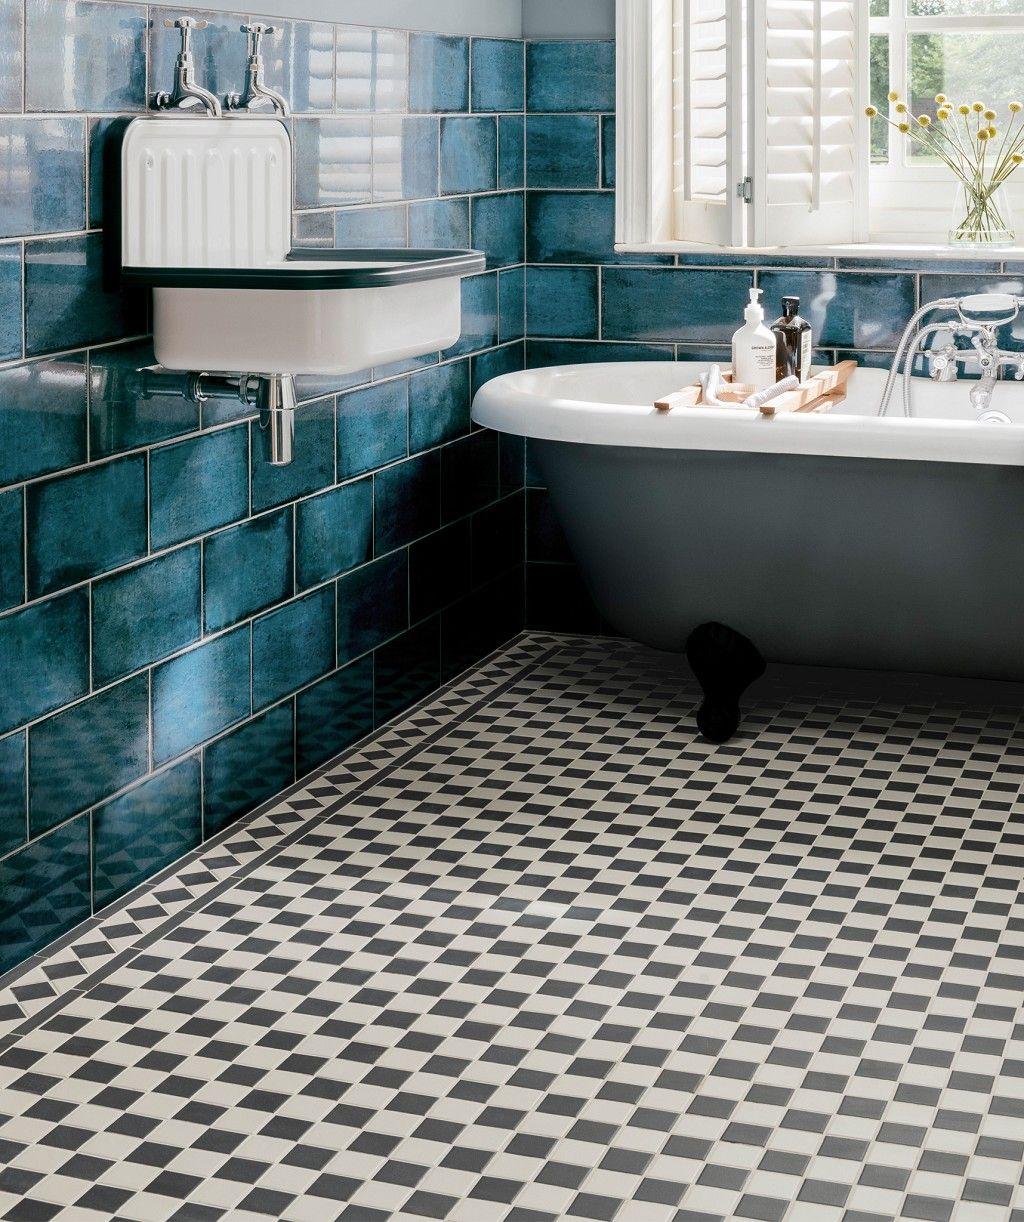 Victorian Black White Chequer Tile Black And White Tiles Bathroom Black And White Bathroom Floor Black Bathroom